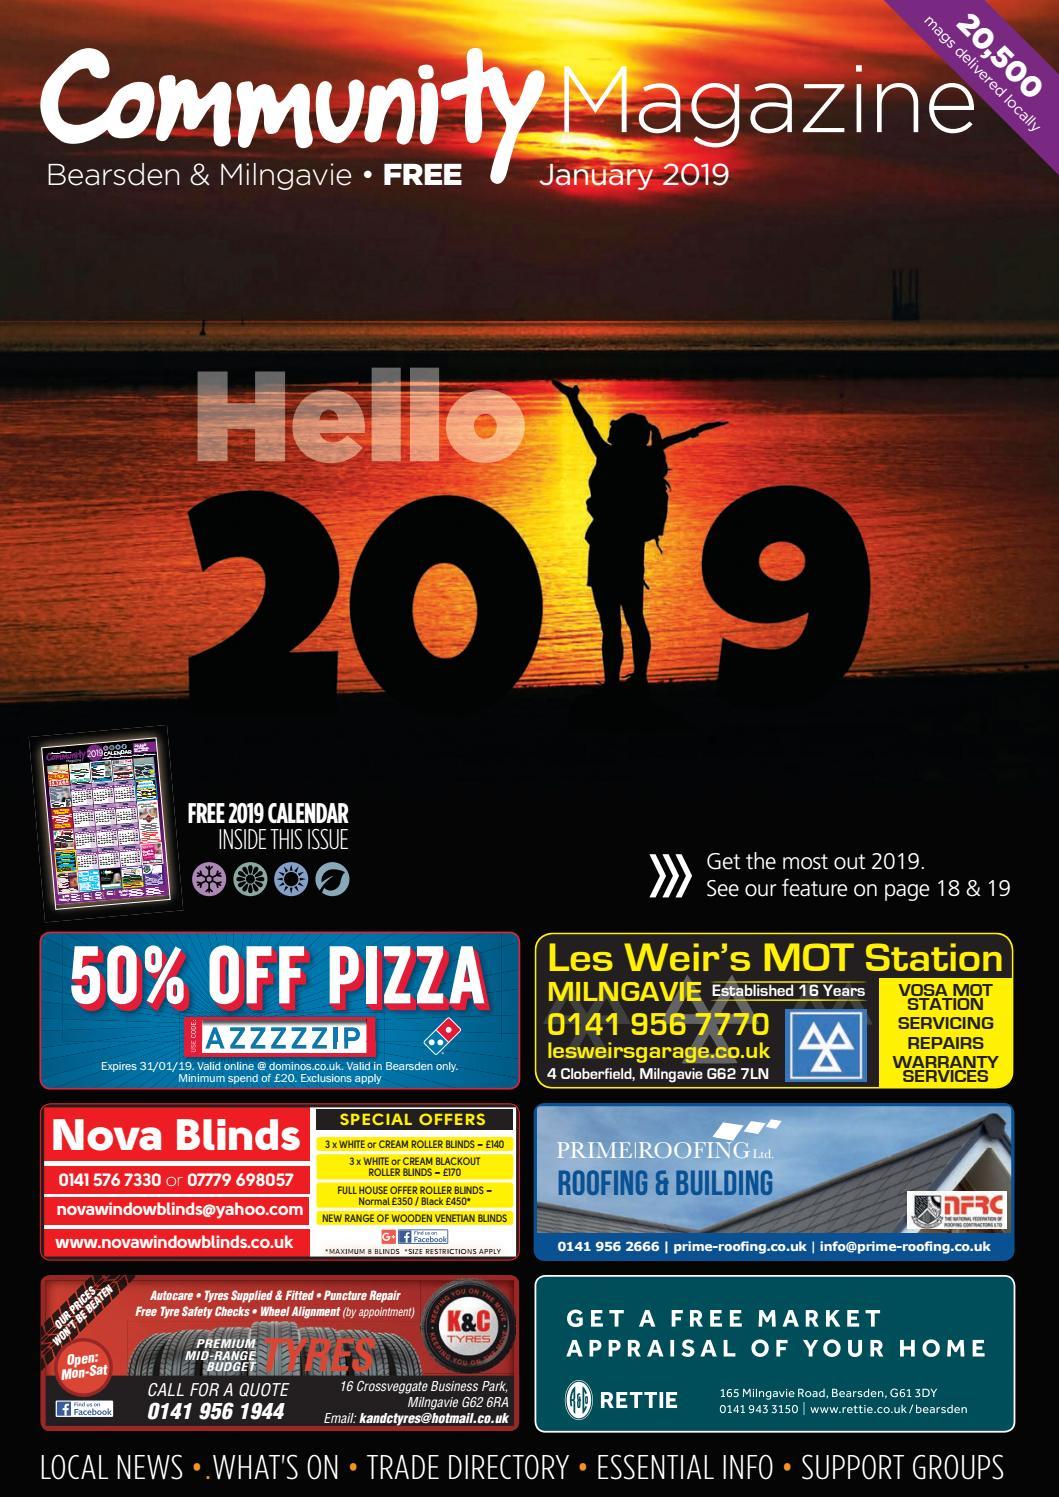 Bearsden Milngavie Community Magazine January 2019 By